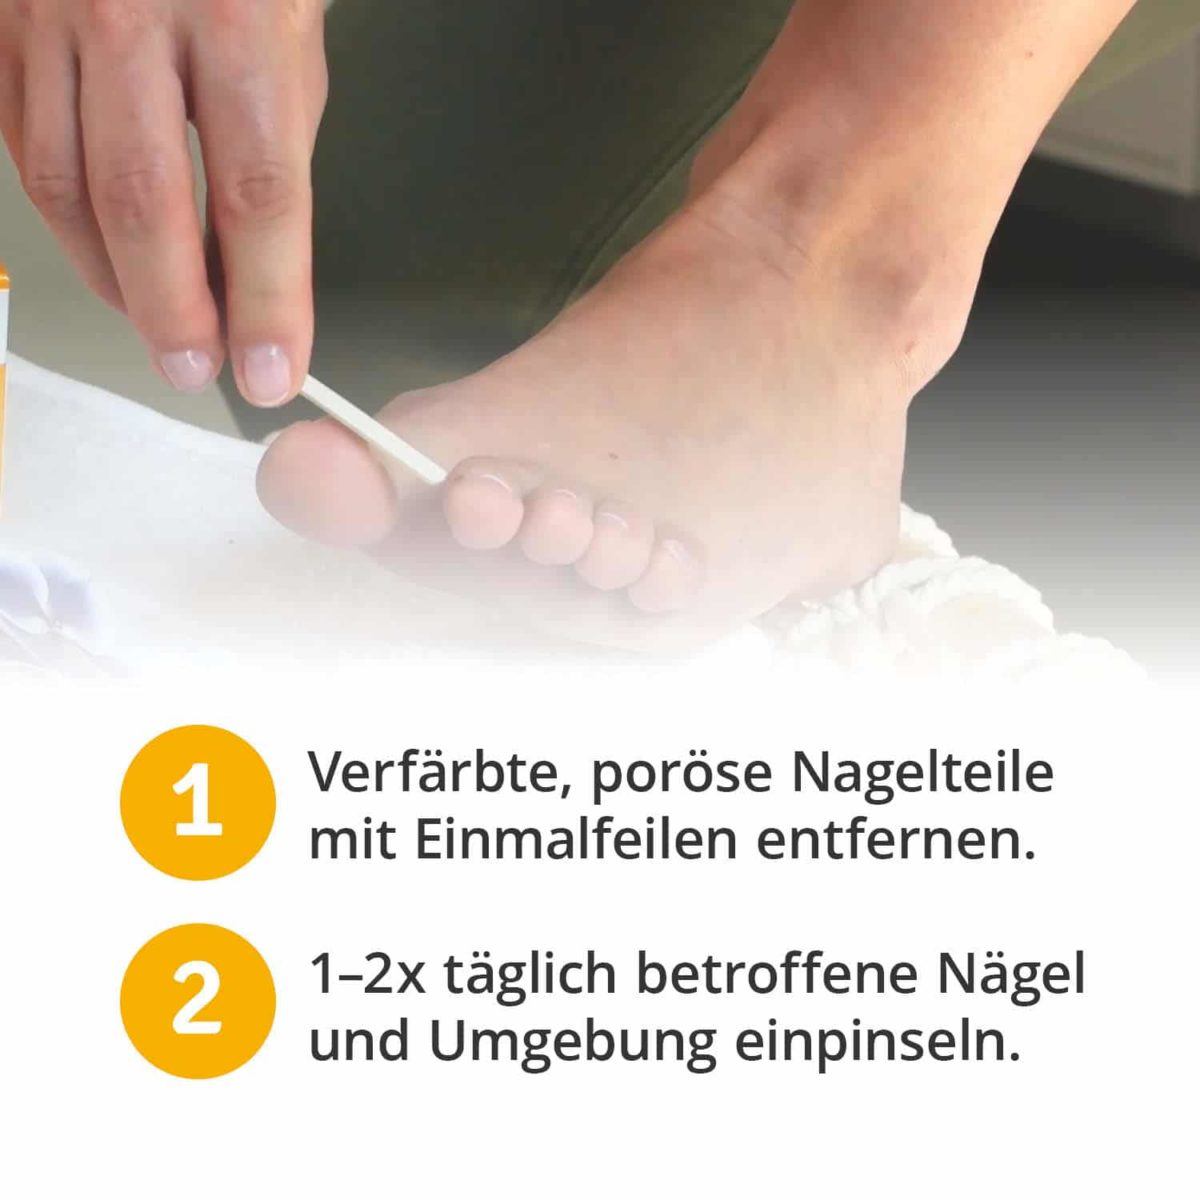 Casida Nagelöl Repair & Protect 10 ml PZN 10022445 Apotheke Nagelpilz Füße Hände6